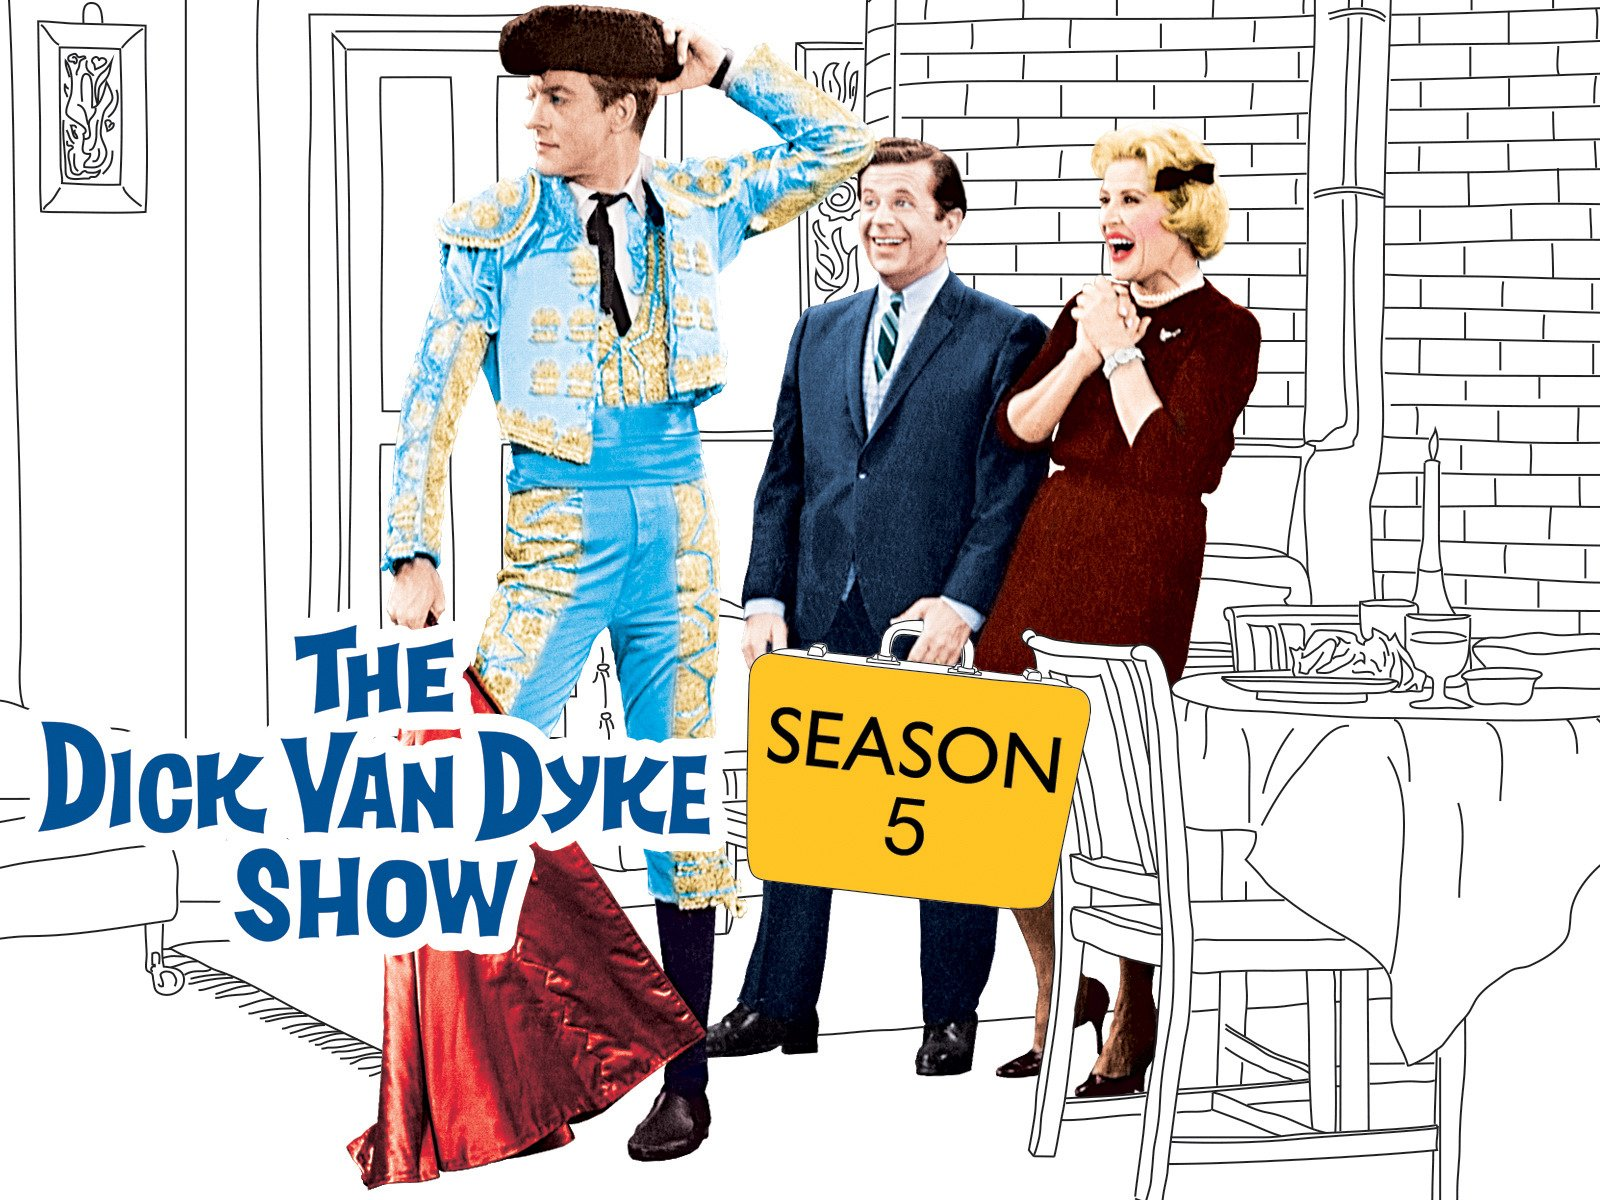 The Dick Van Dyke Show - Season 5